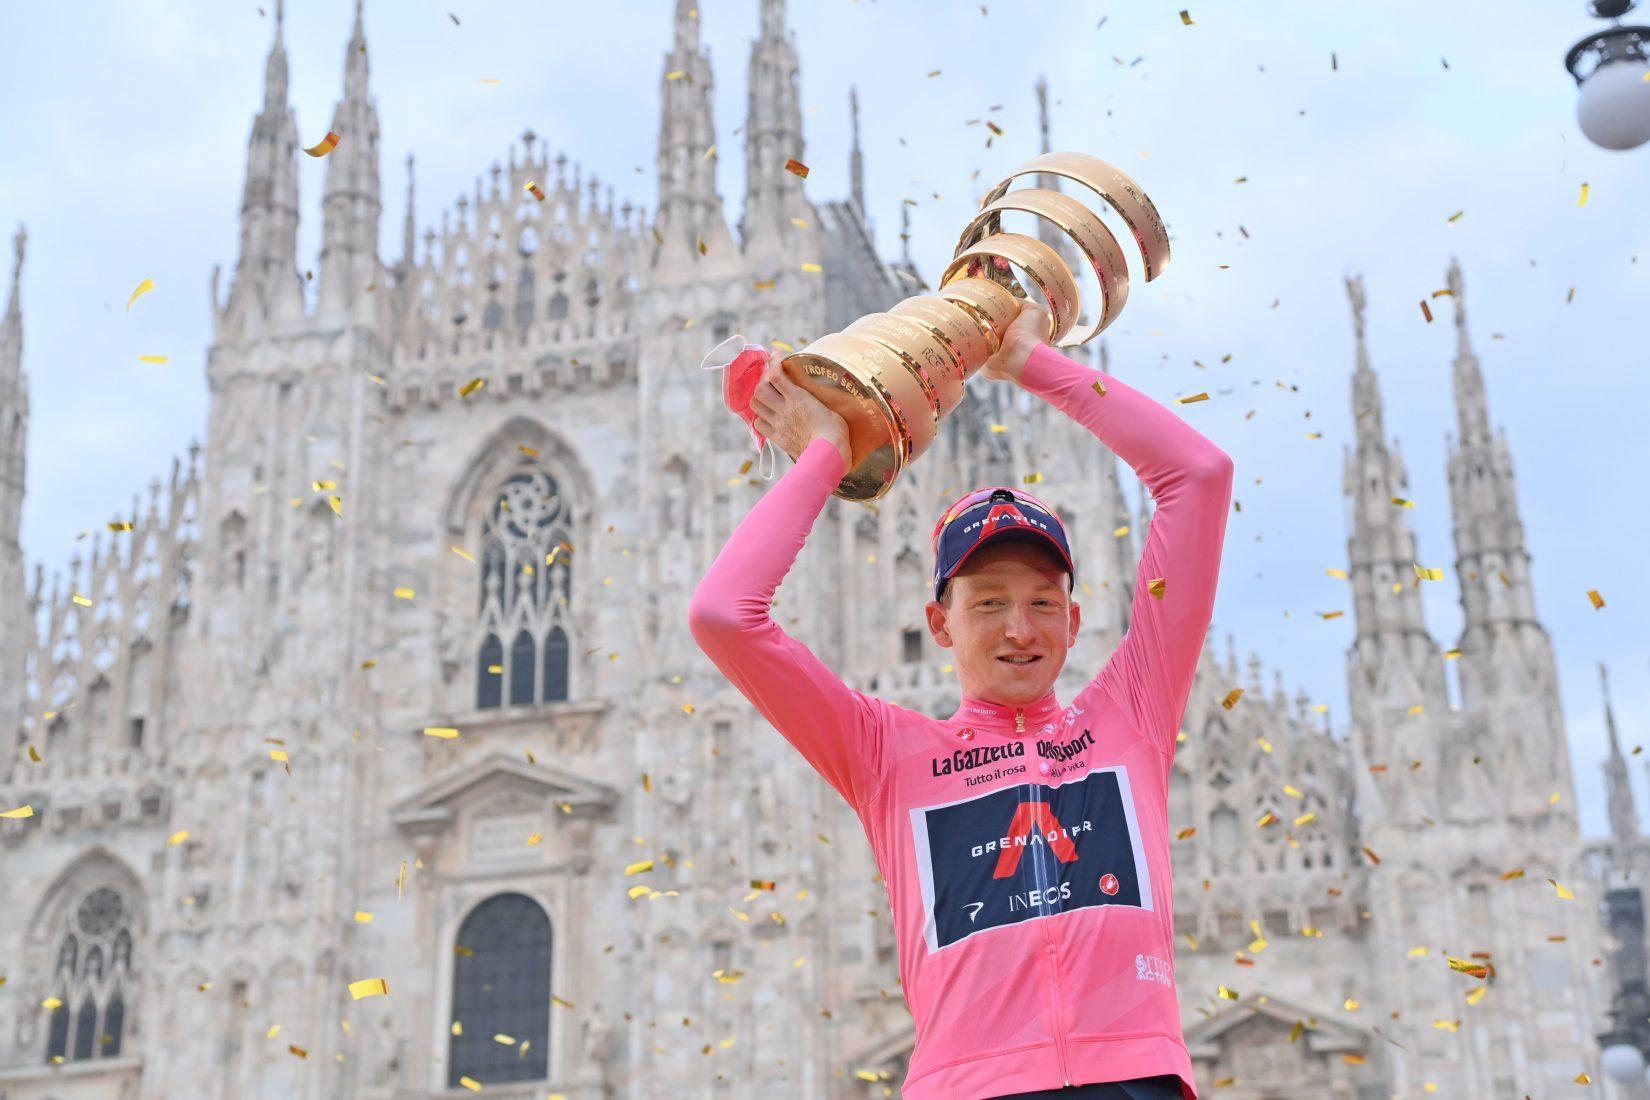 Tao Geoghegan Hart ha vinto il 103^ Giro d'Italia